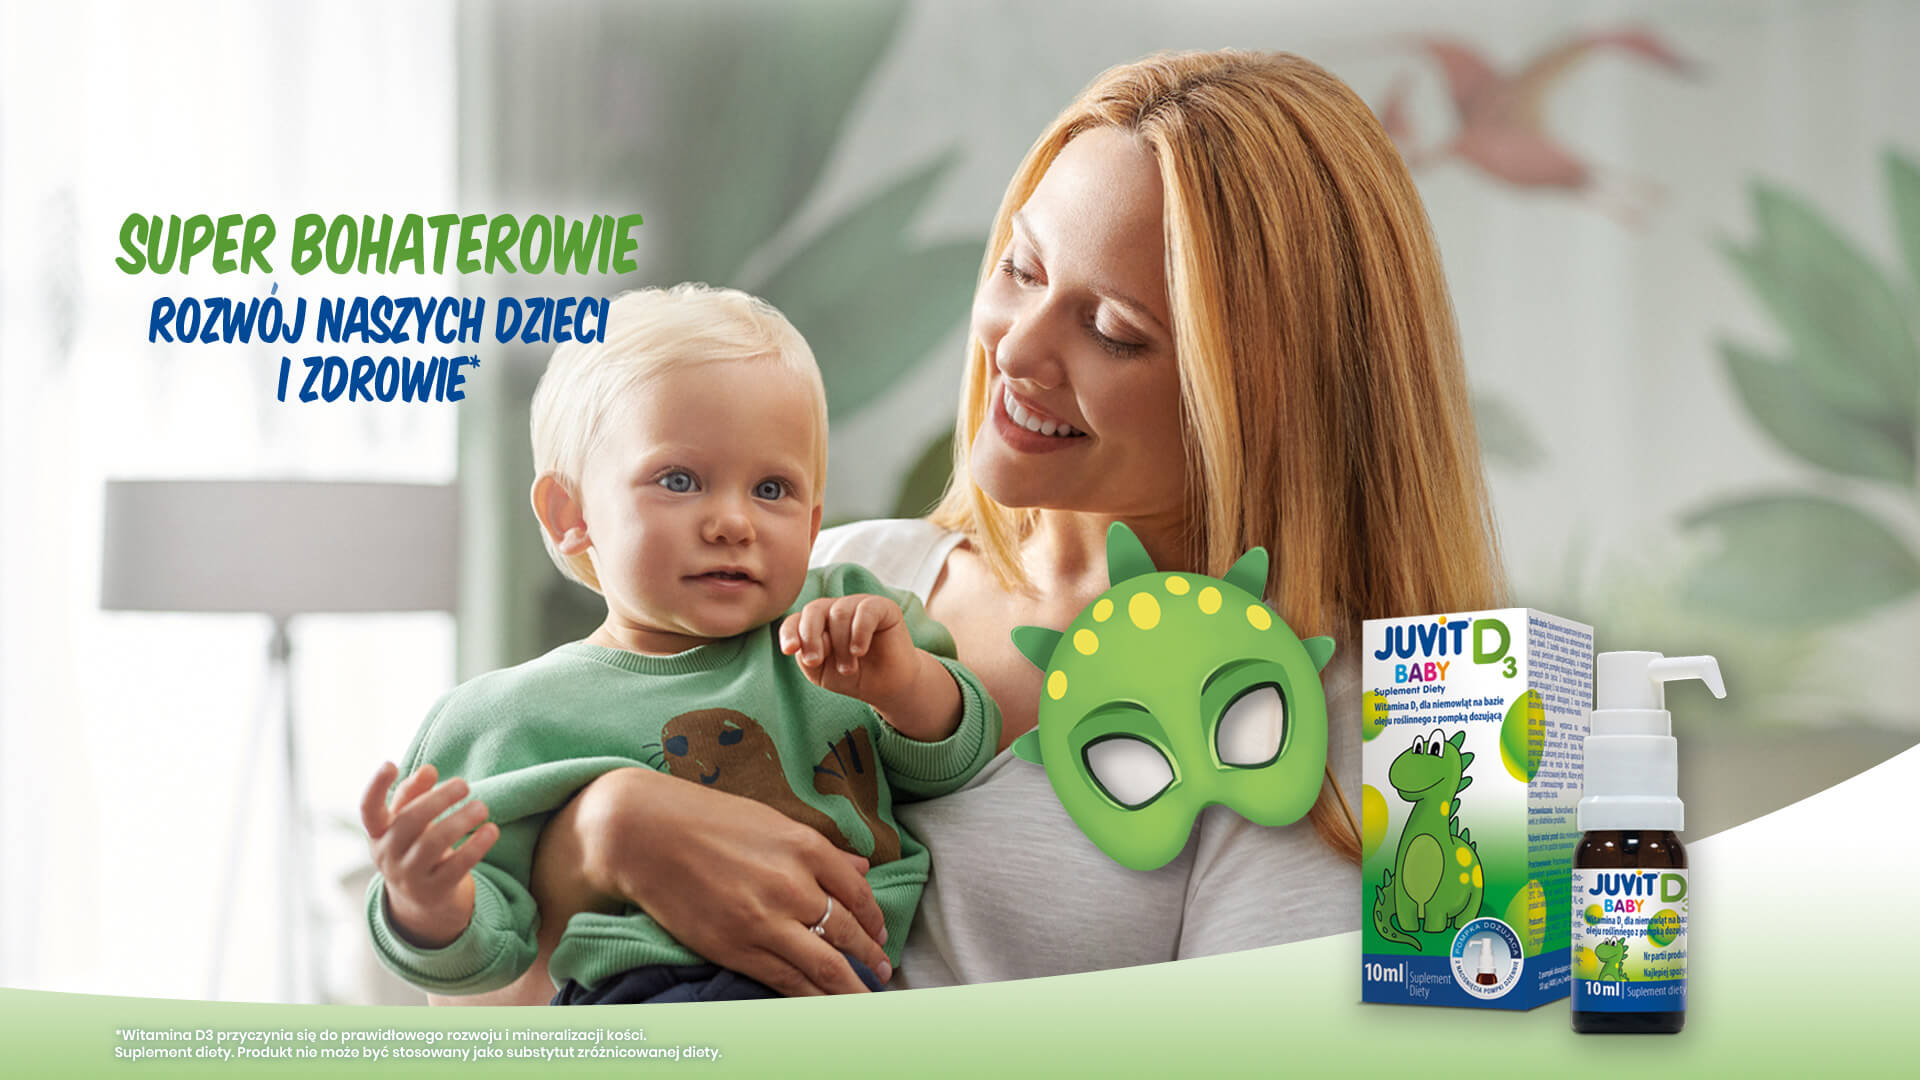 Juvit D3 Baby